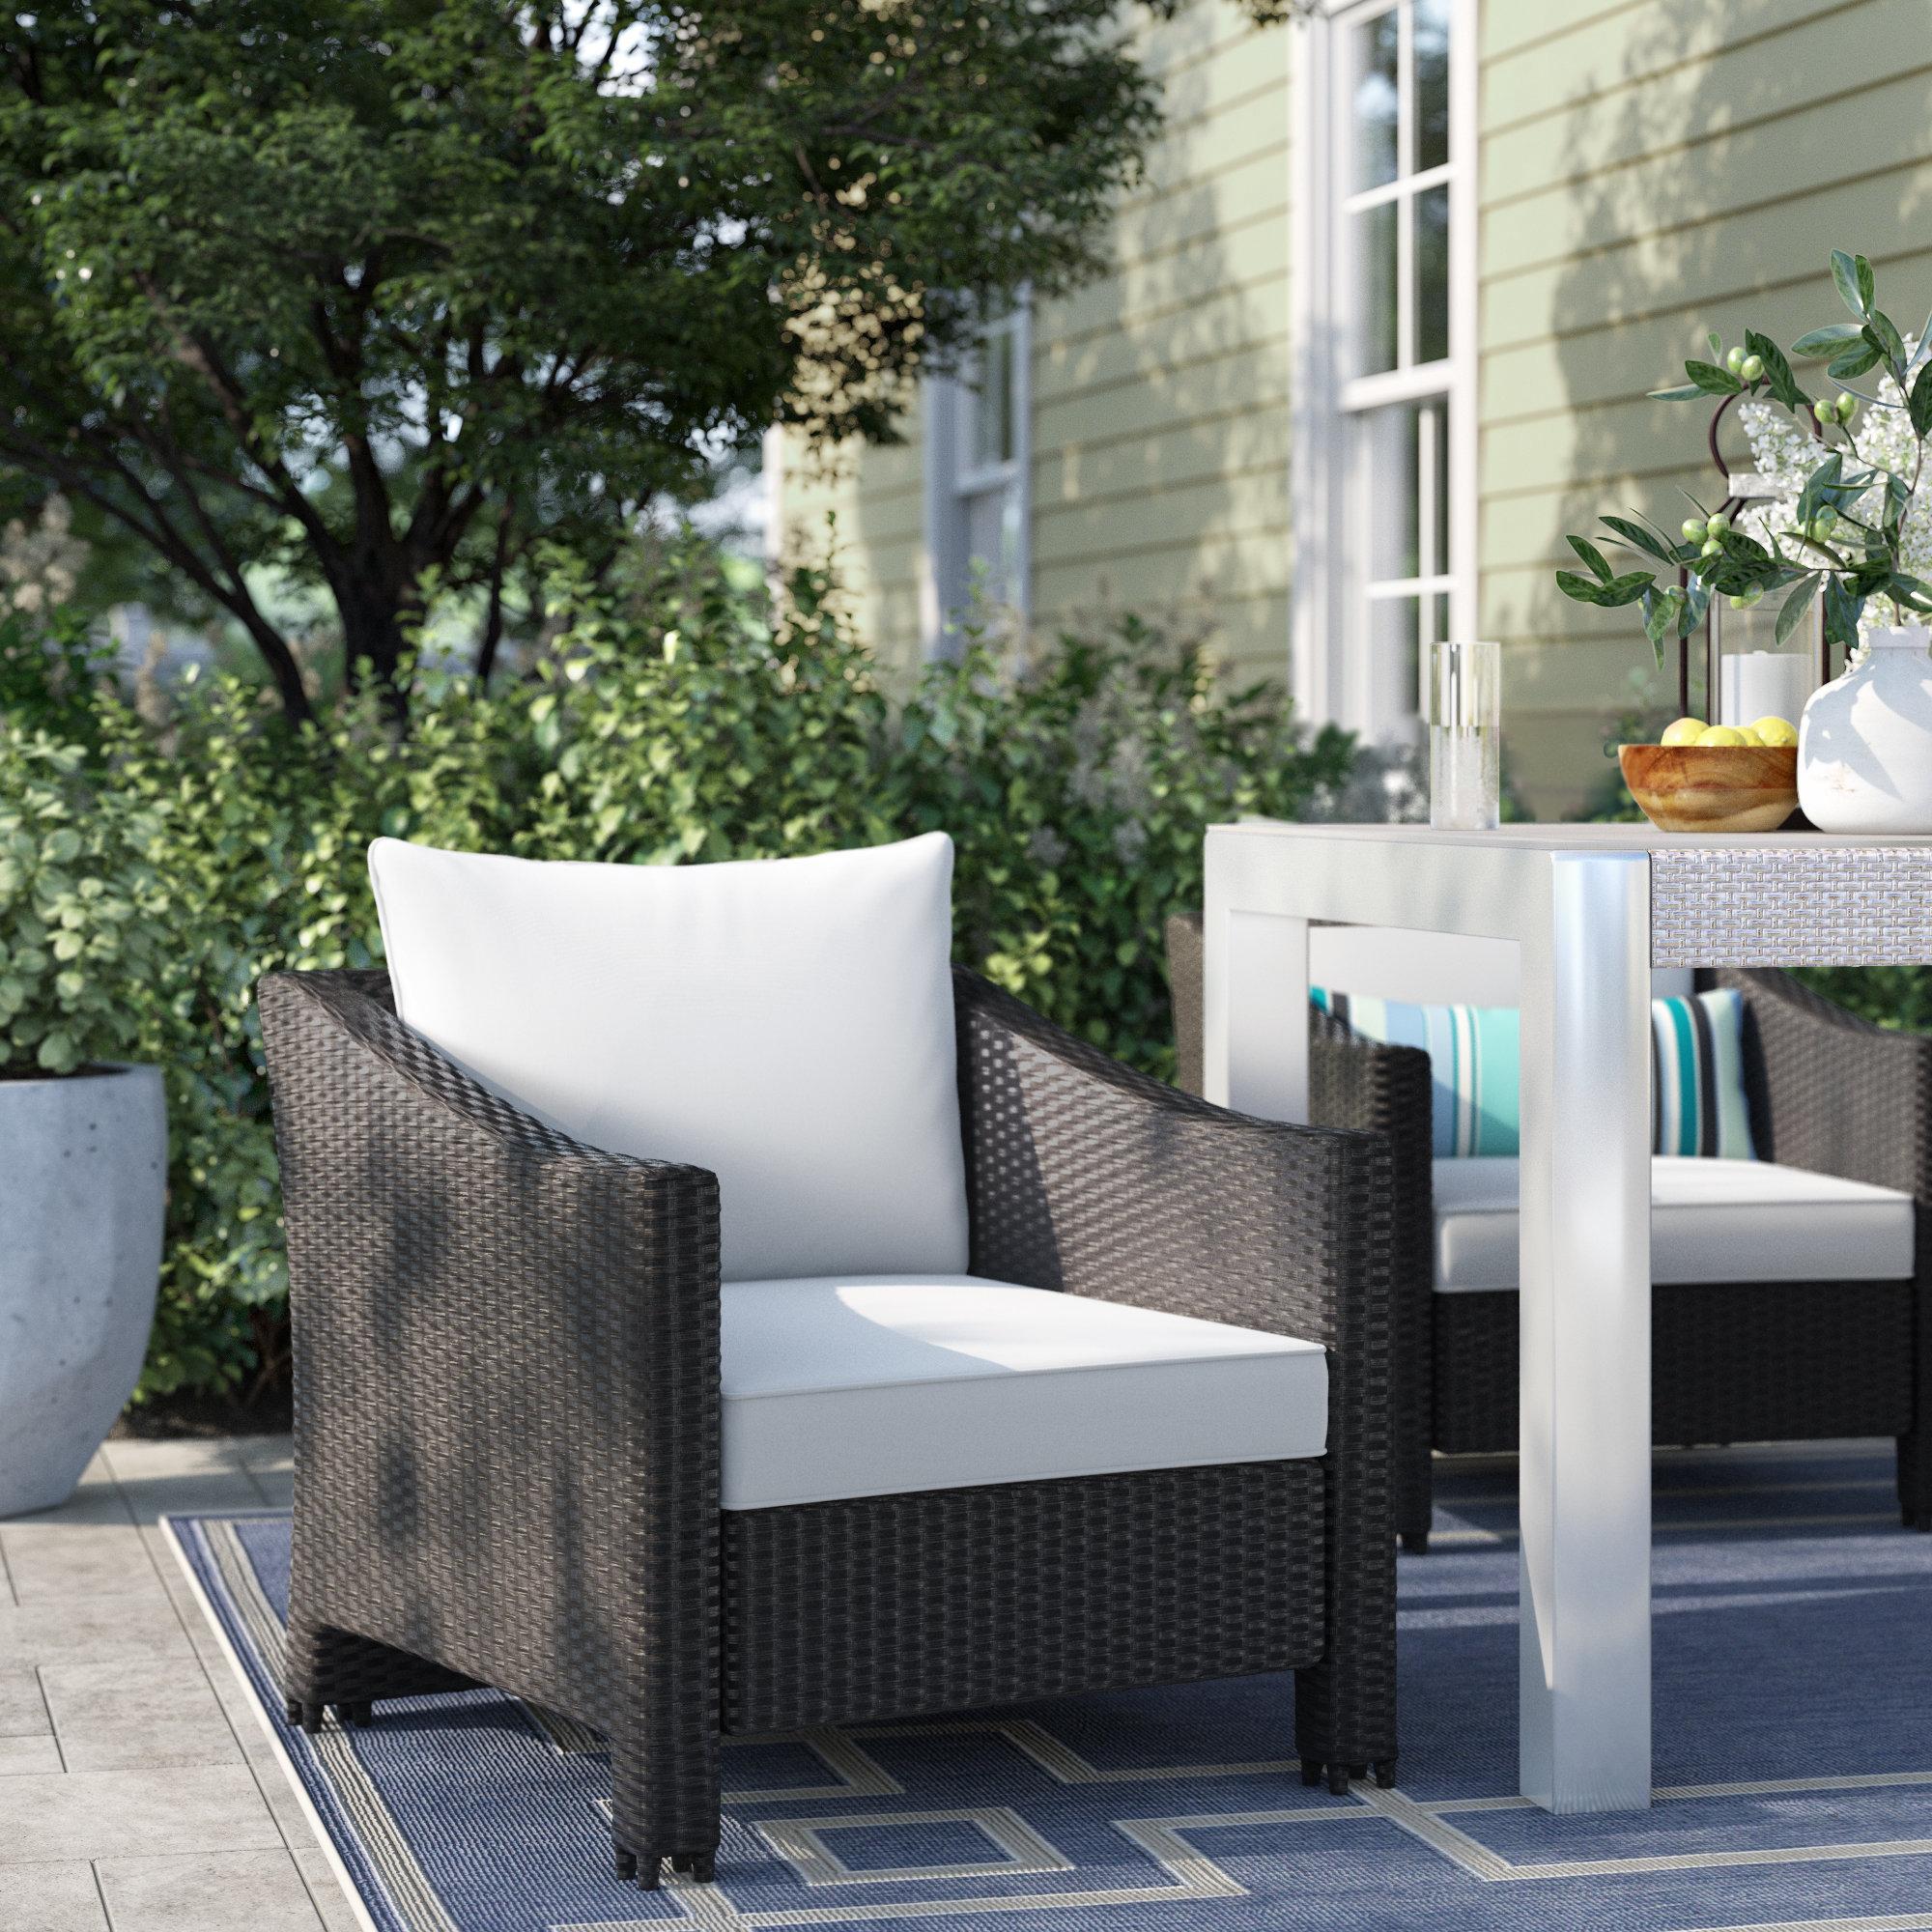 2019 Stapleton Wicker Resin Patio Sofas With Cushions Within Portola Wicker Patio Chair With Cushions (View 1 of 20)